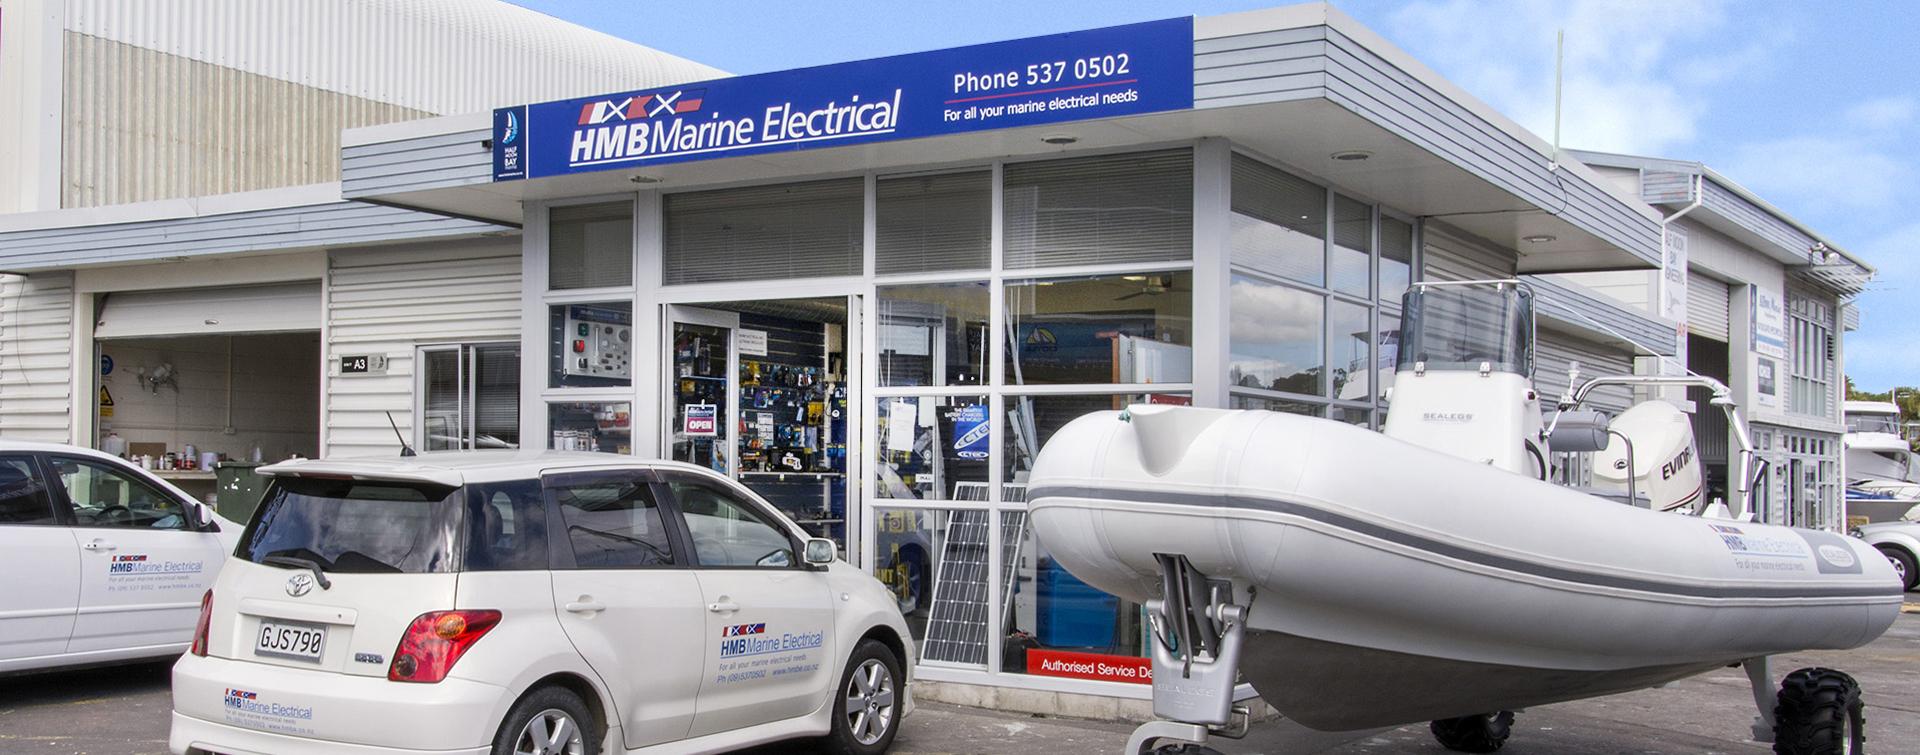 180131 HMB_Marine_Electrical_Shopfront-1920-x755-1.jpg